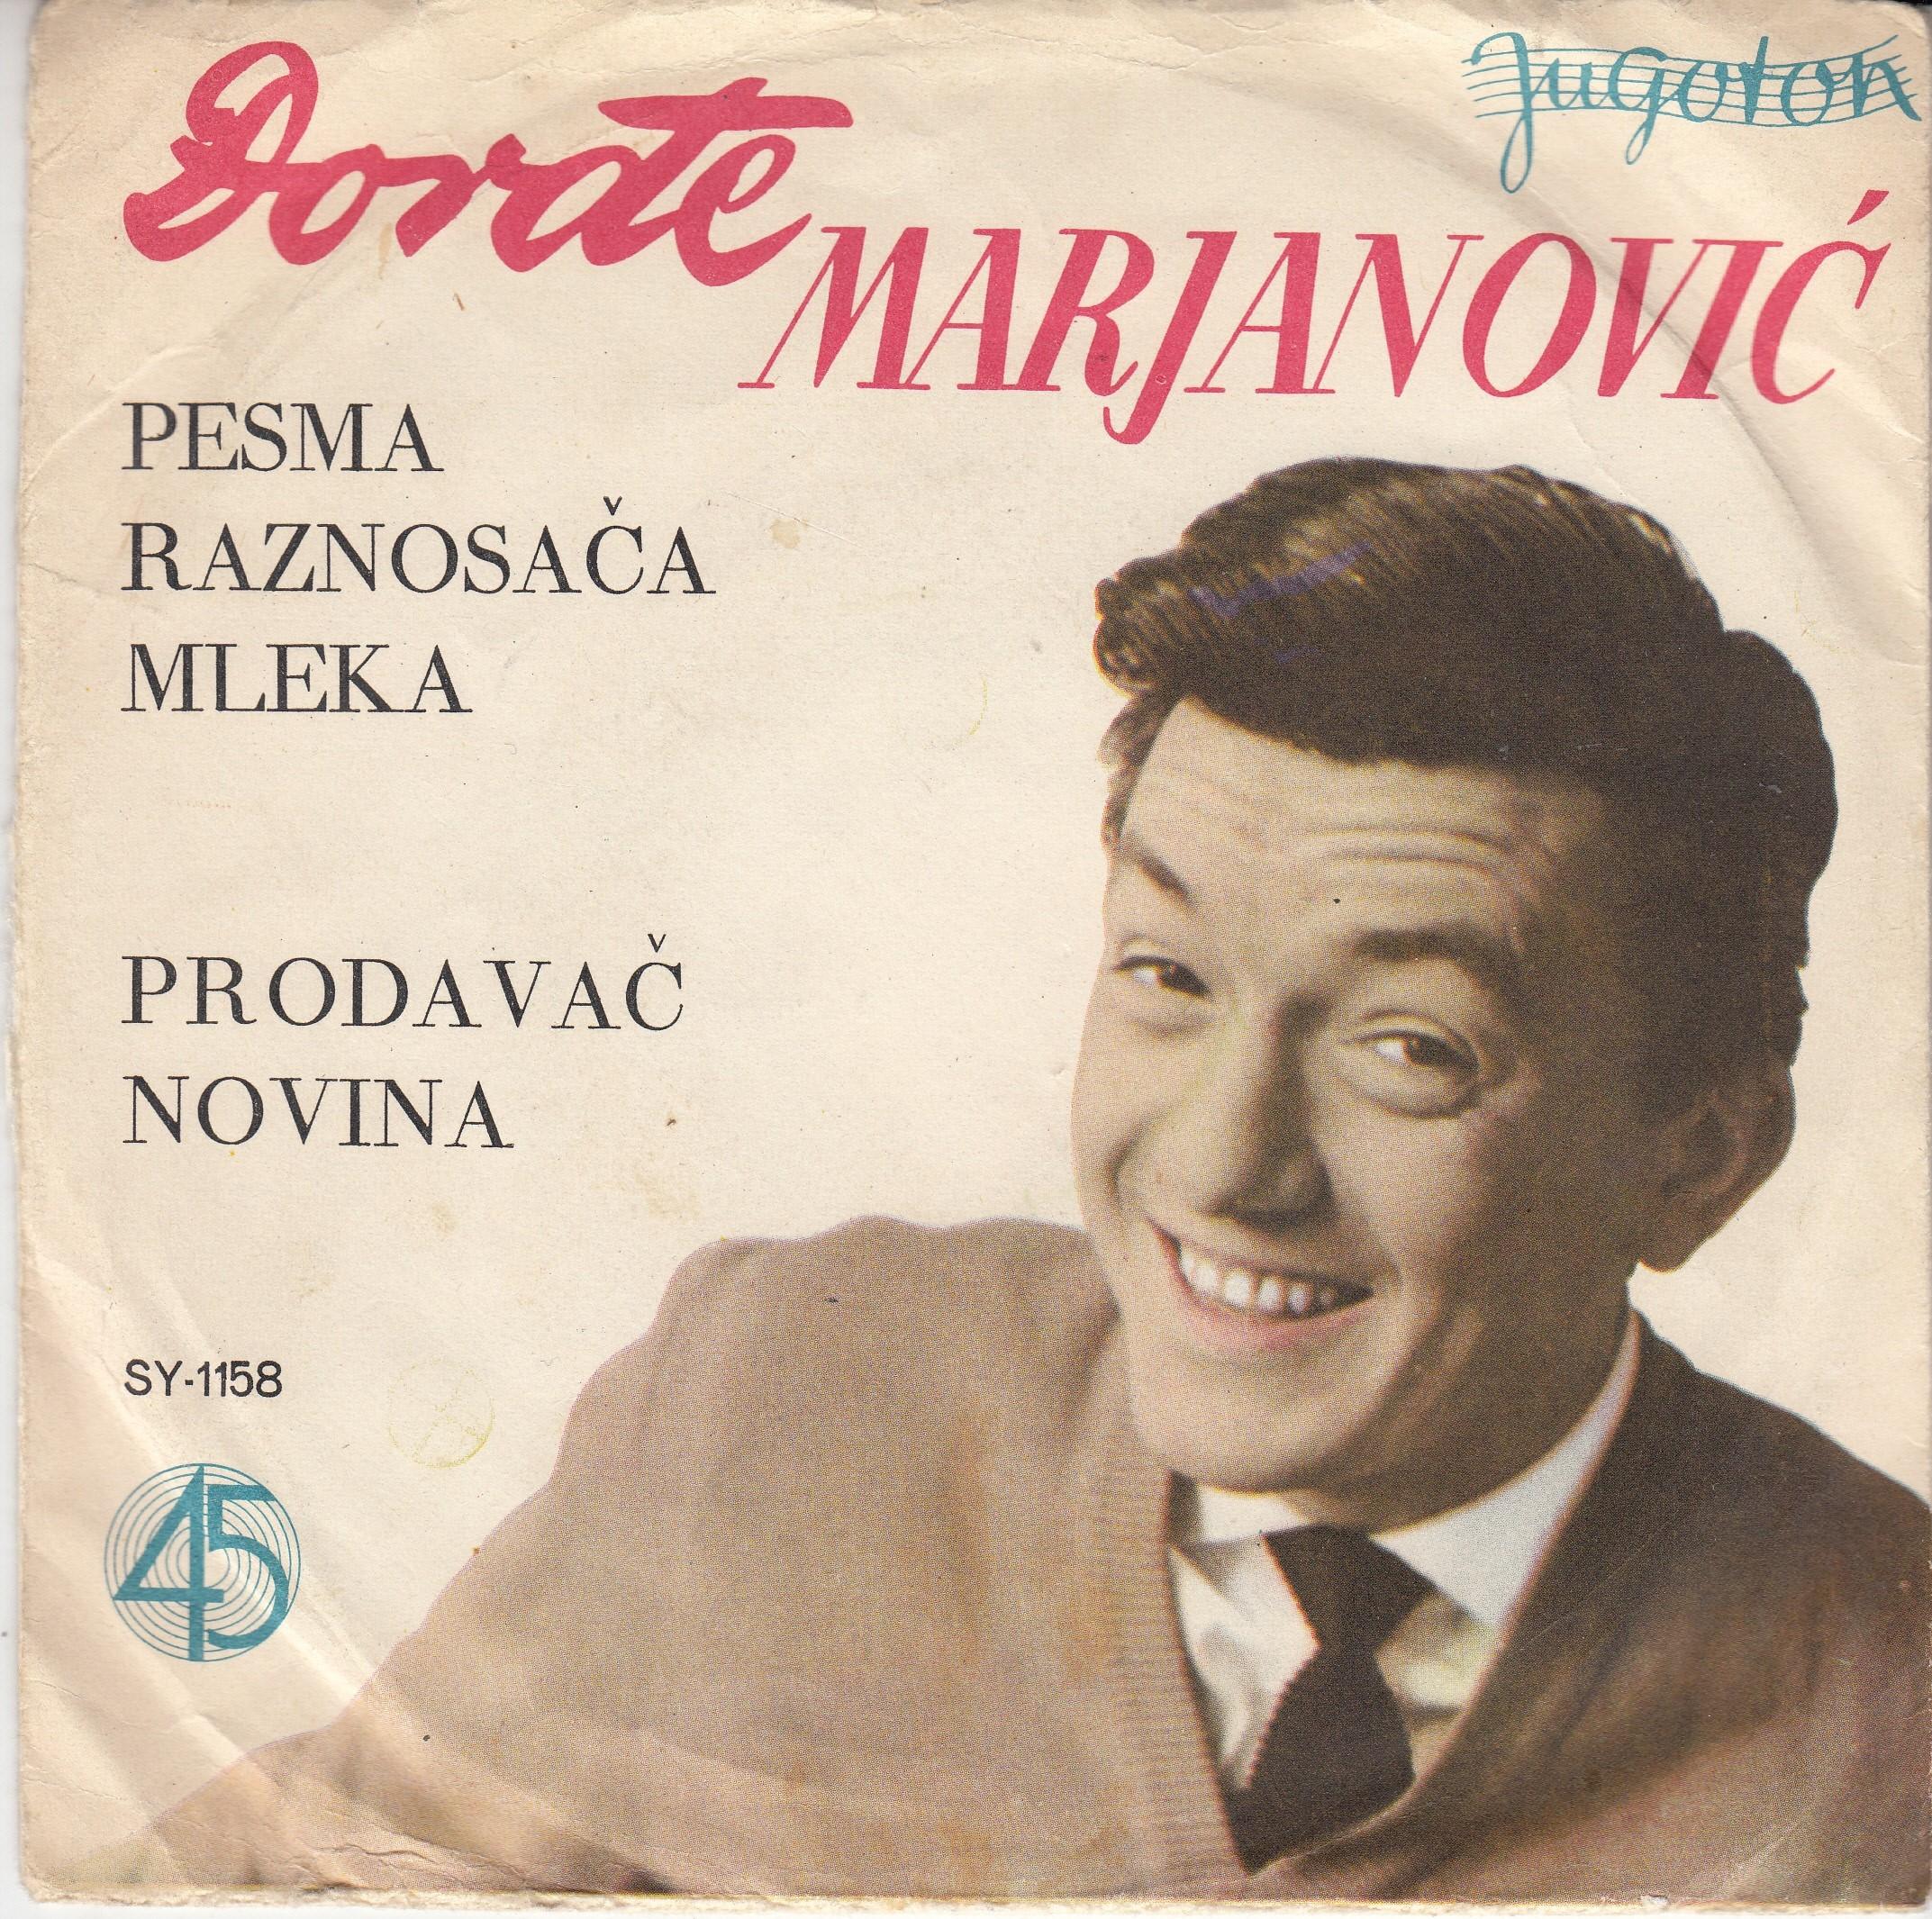 Marjanovic Djordje - Pesma Raznosaca Mleka/prodavac Novina